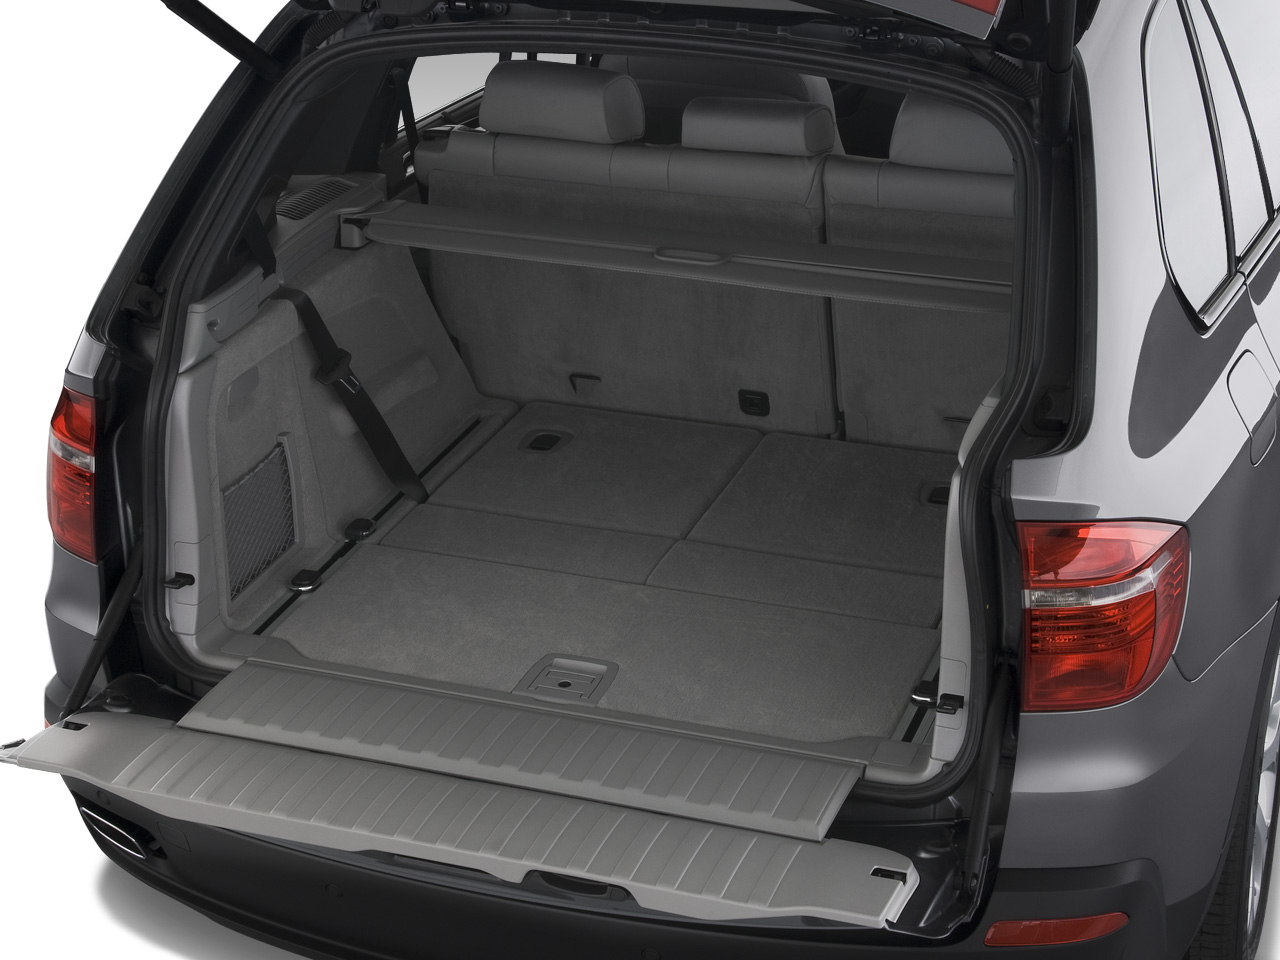 All Types 2008 x5 : 2008 BMW Vision EfficientDynamics X5 Concept - Latest News ...